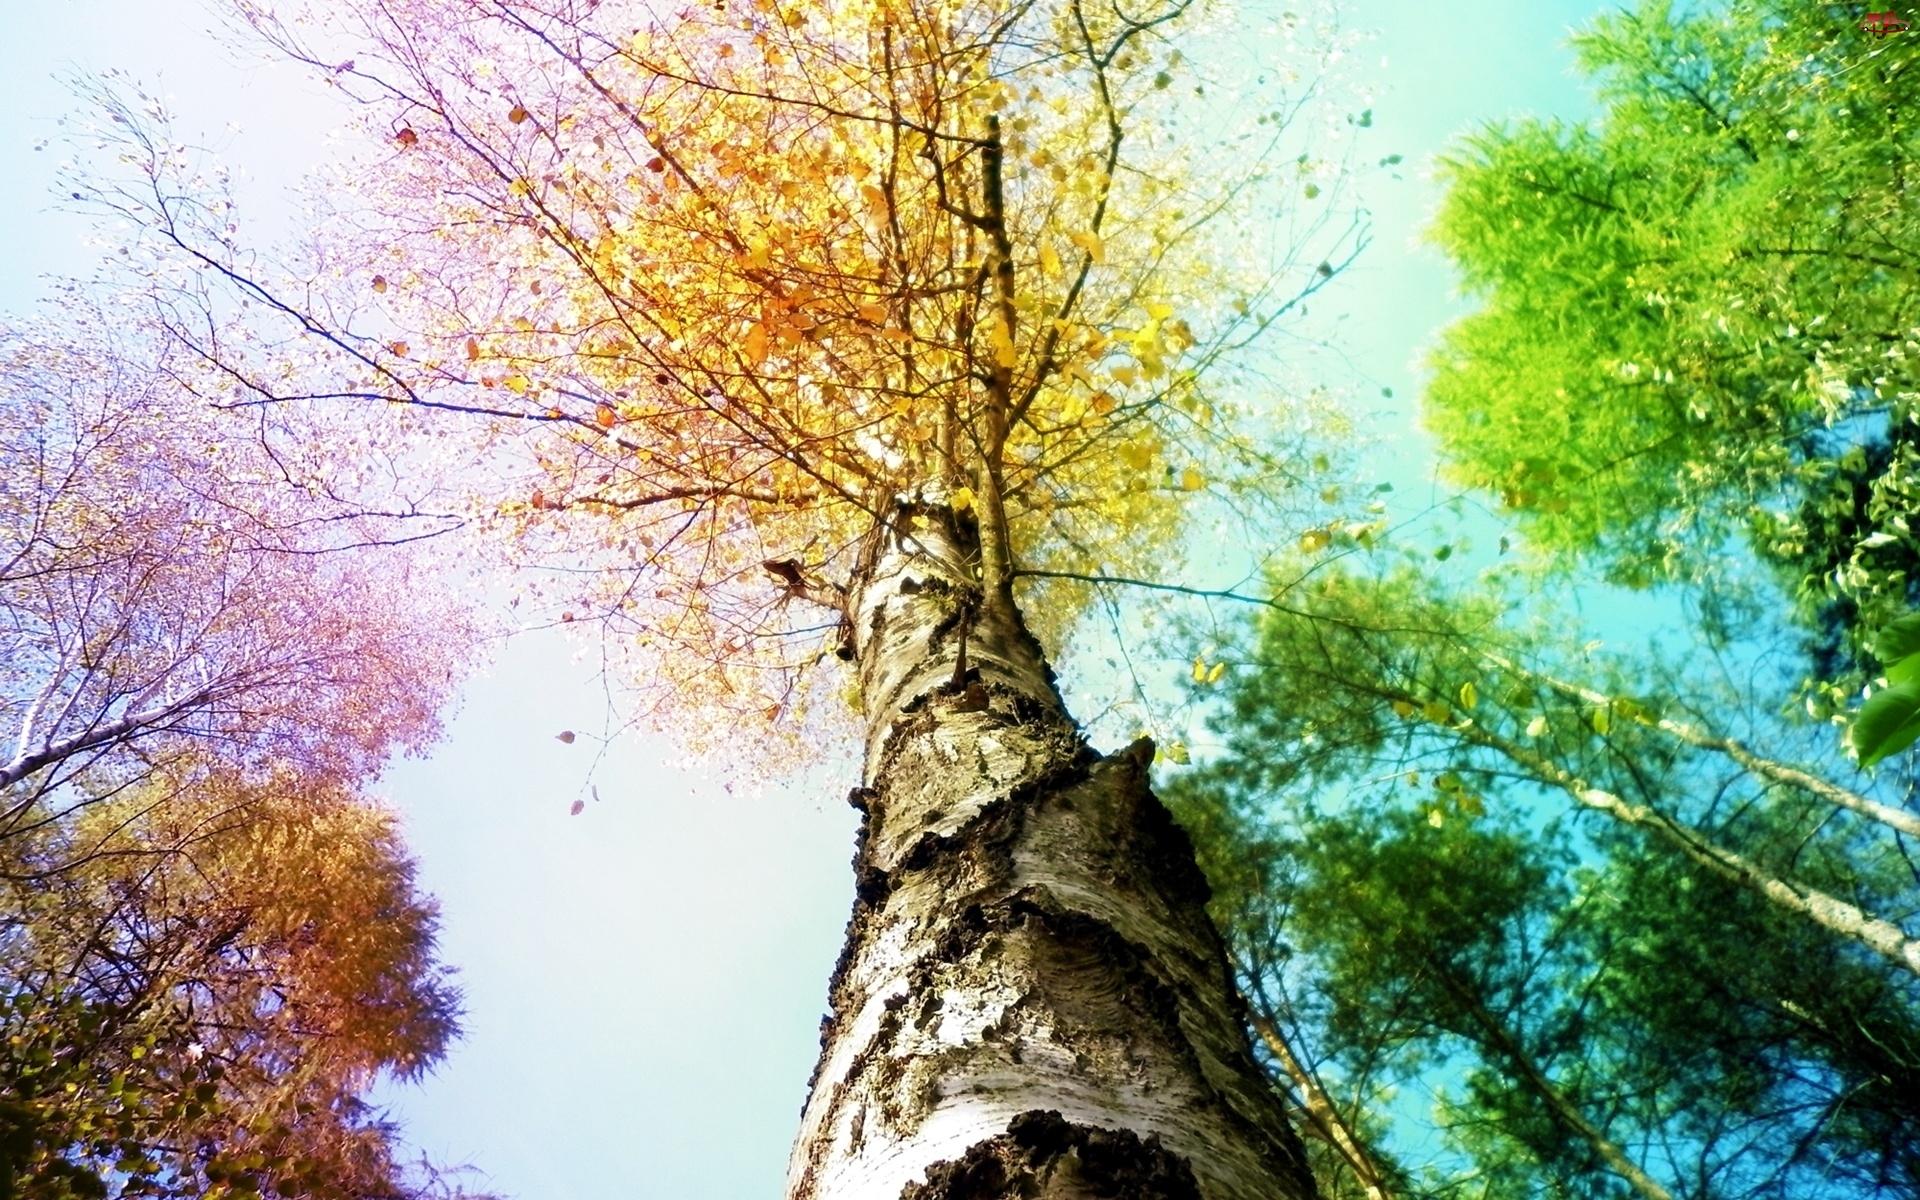 Drzewa, Brzoza, Kolory, Niebo